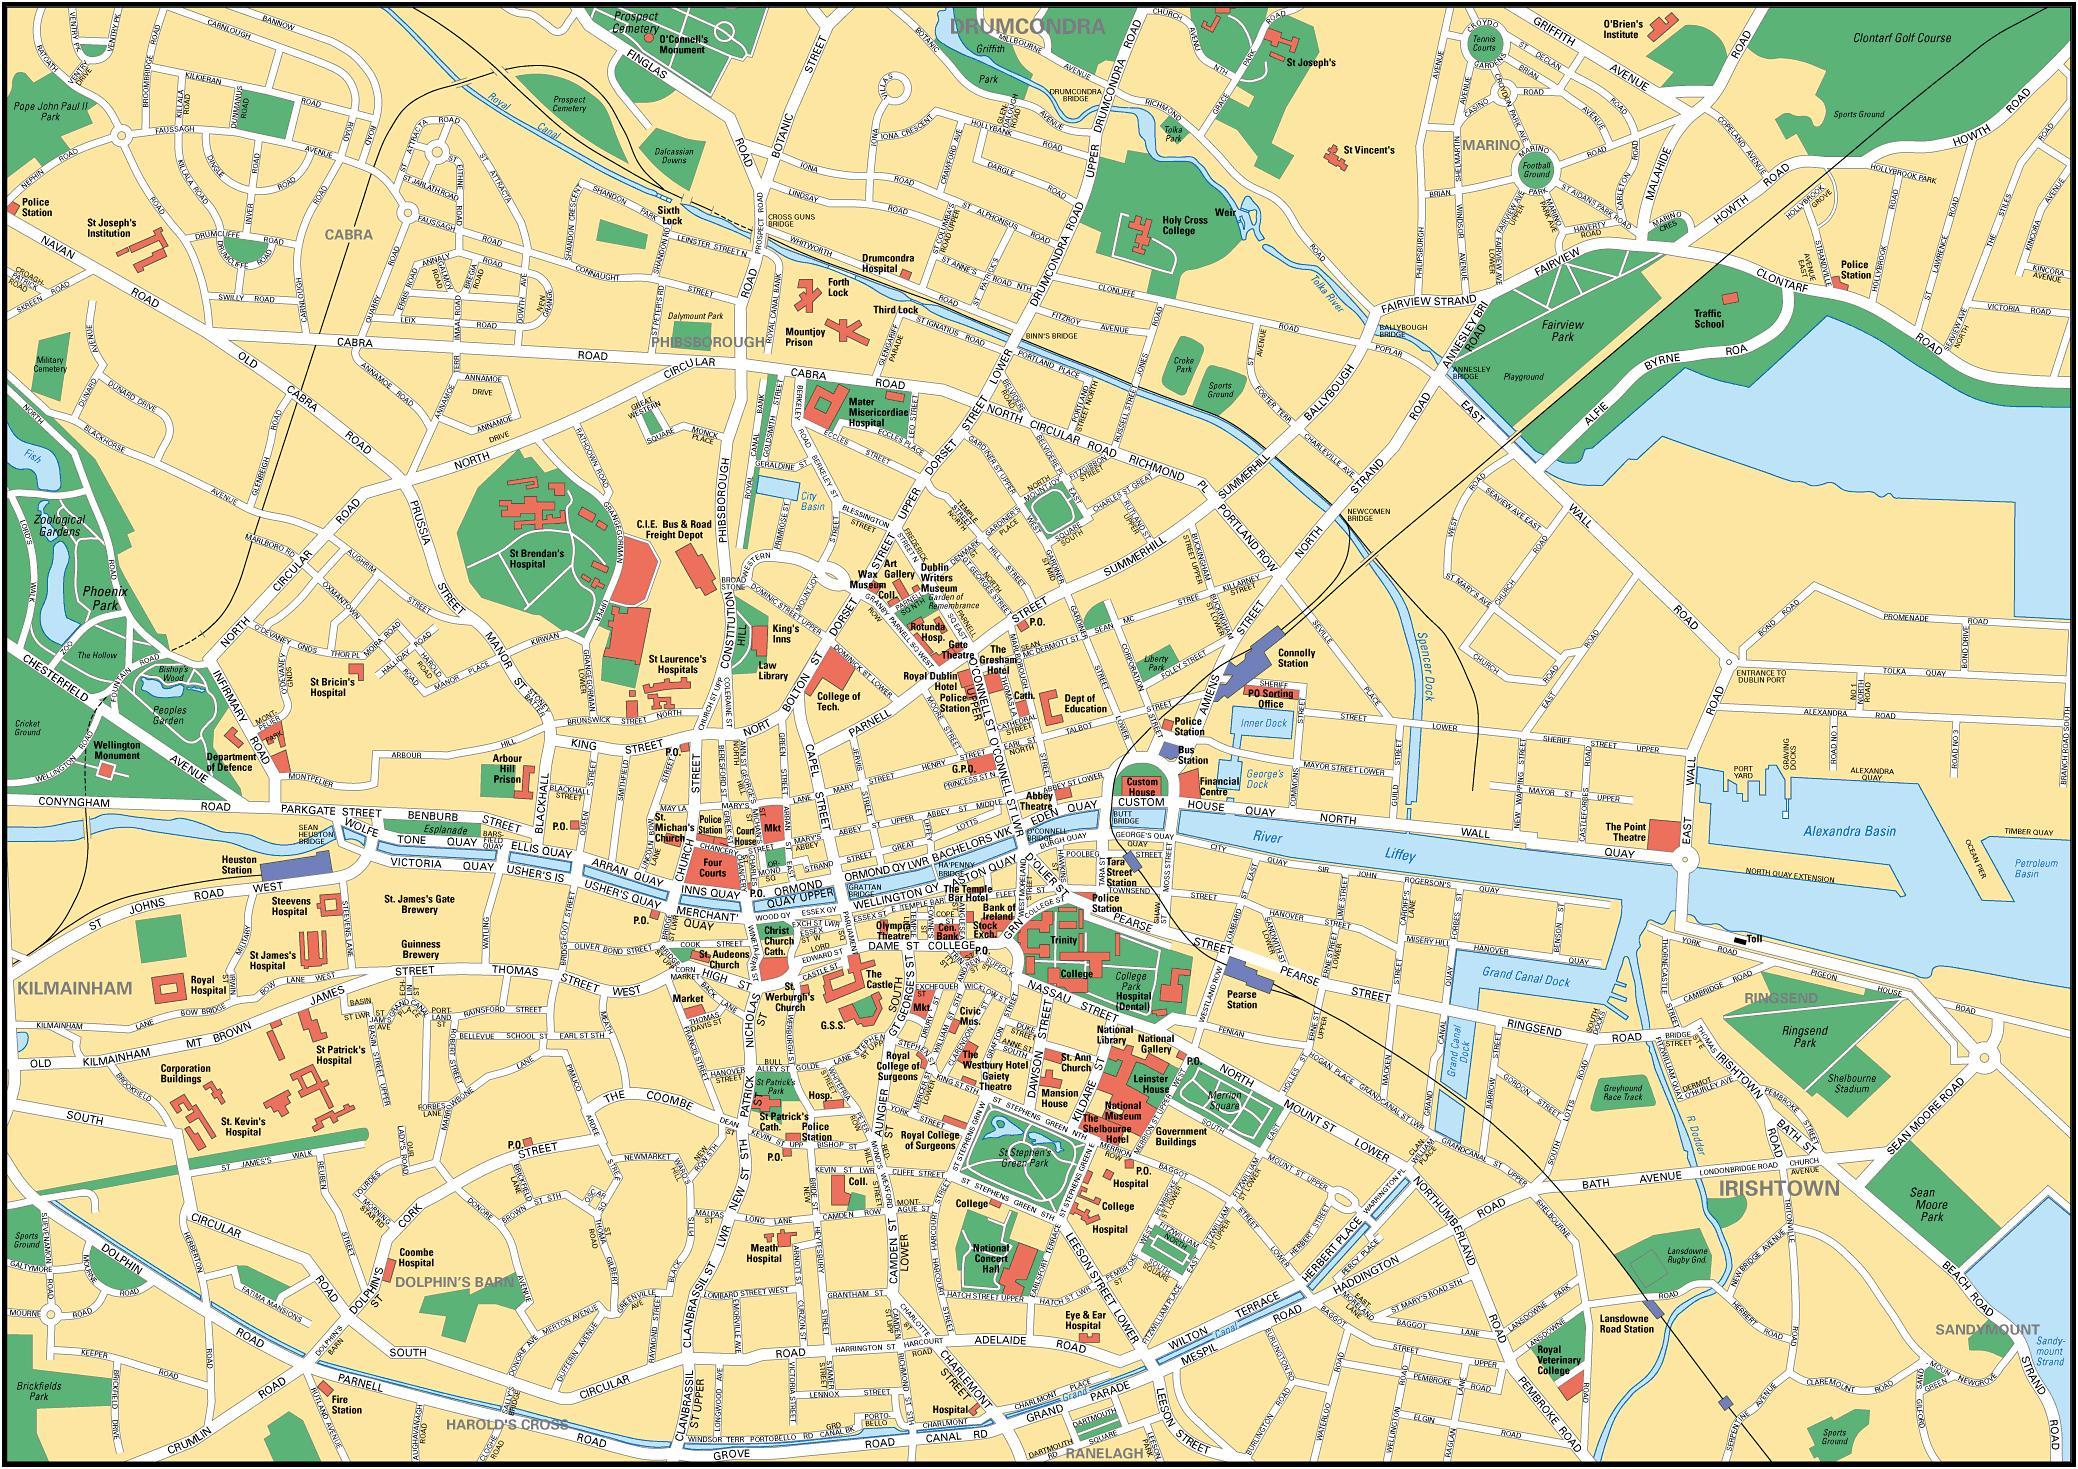 Kartta Dublin Irlanti Dublinin Keskustan Kartta Irlanti